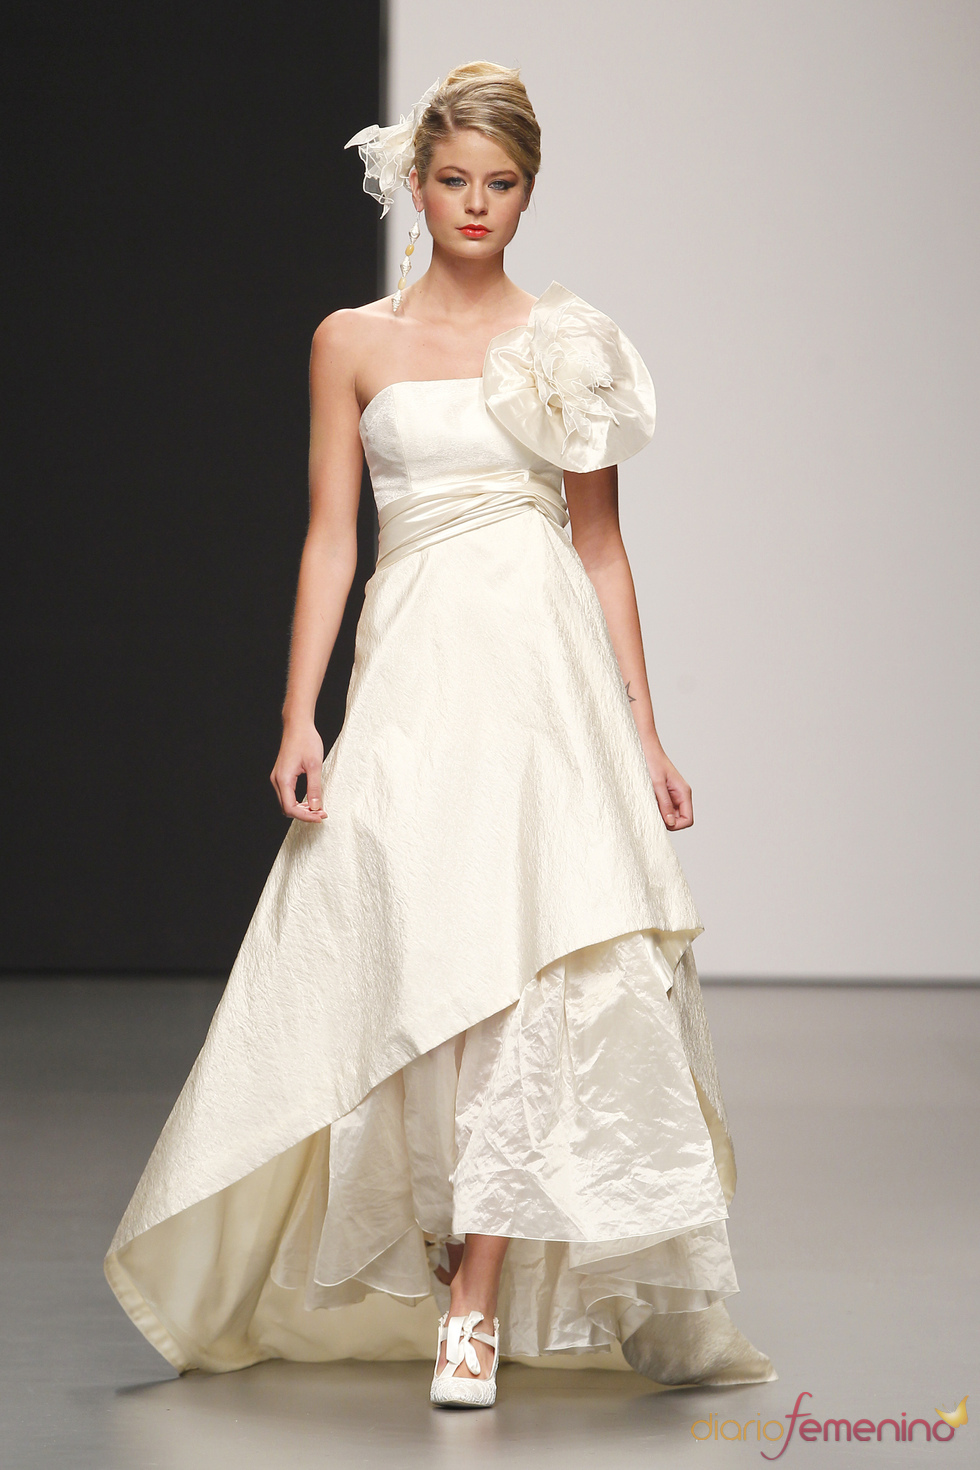 Vestido de novia de Rubén Perlotti